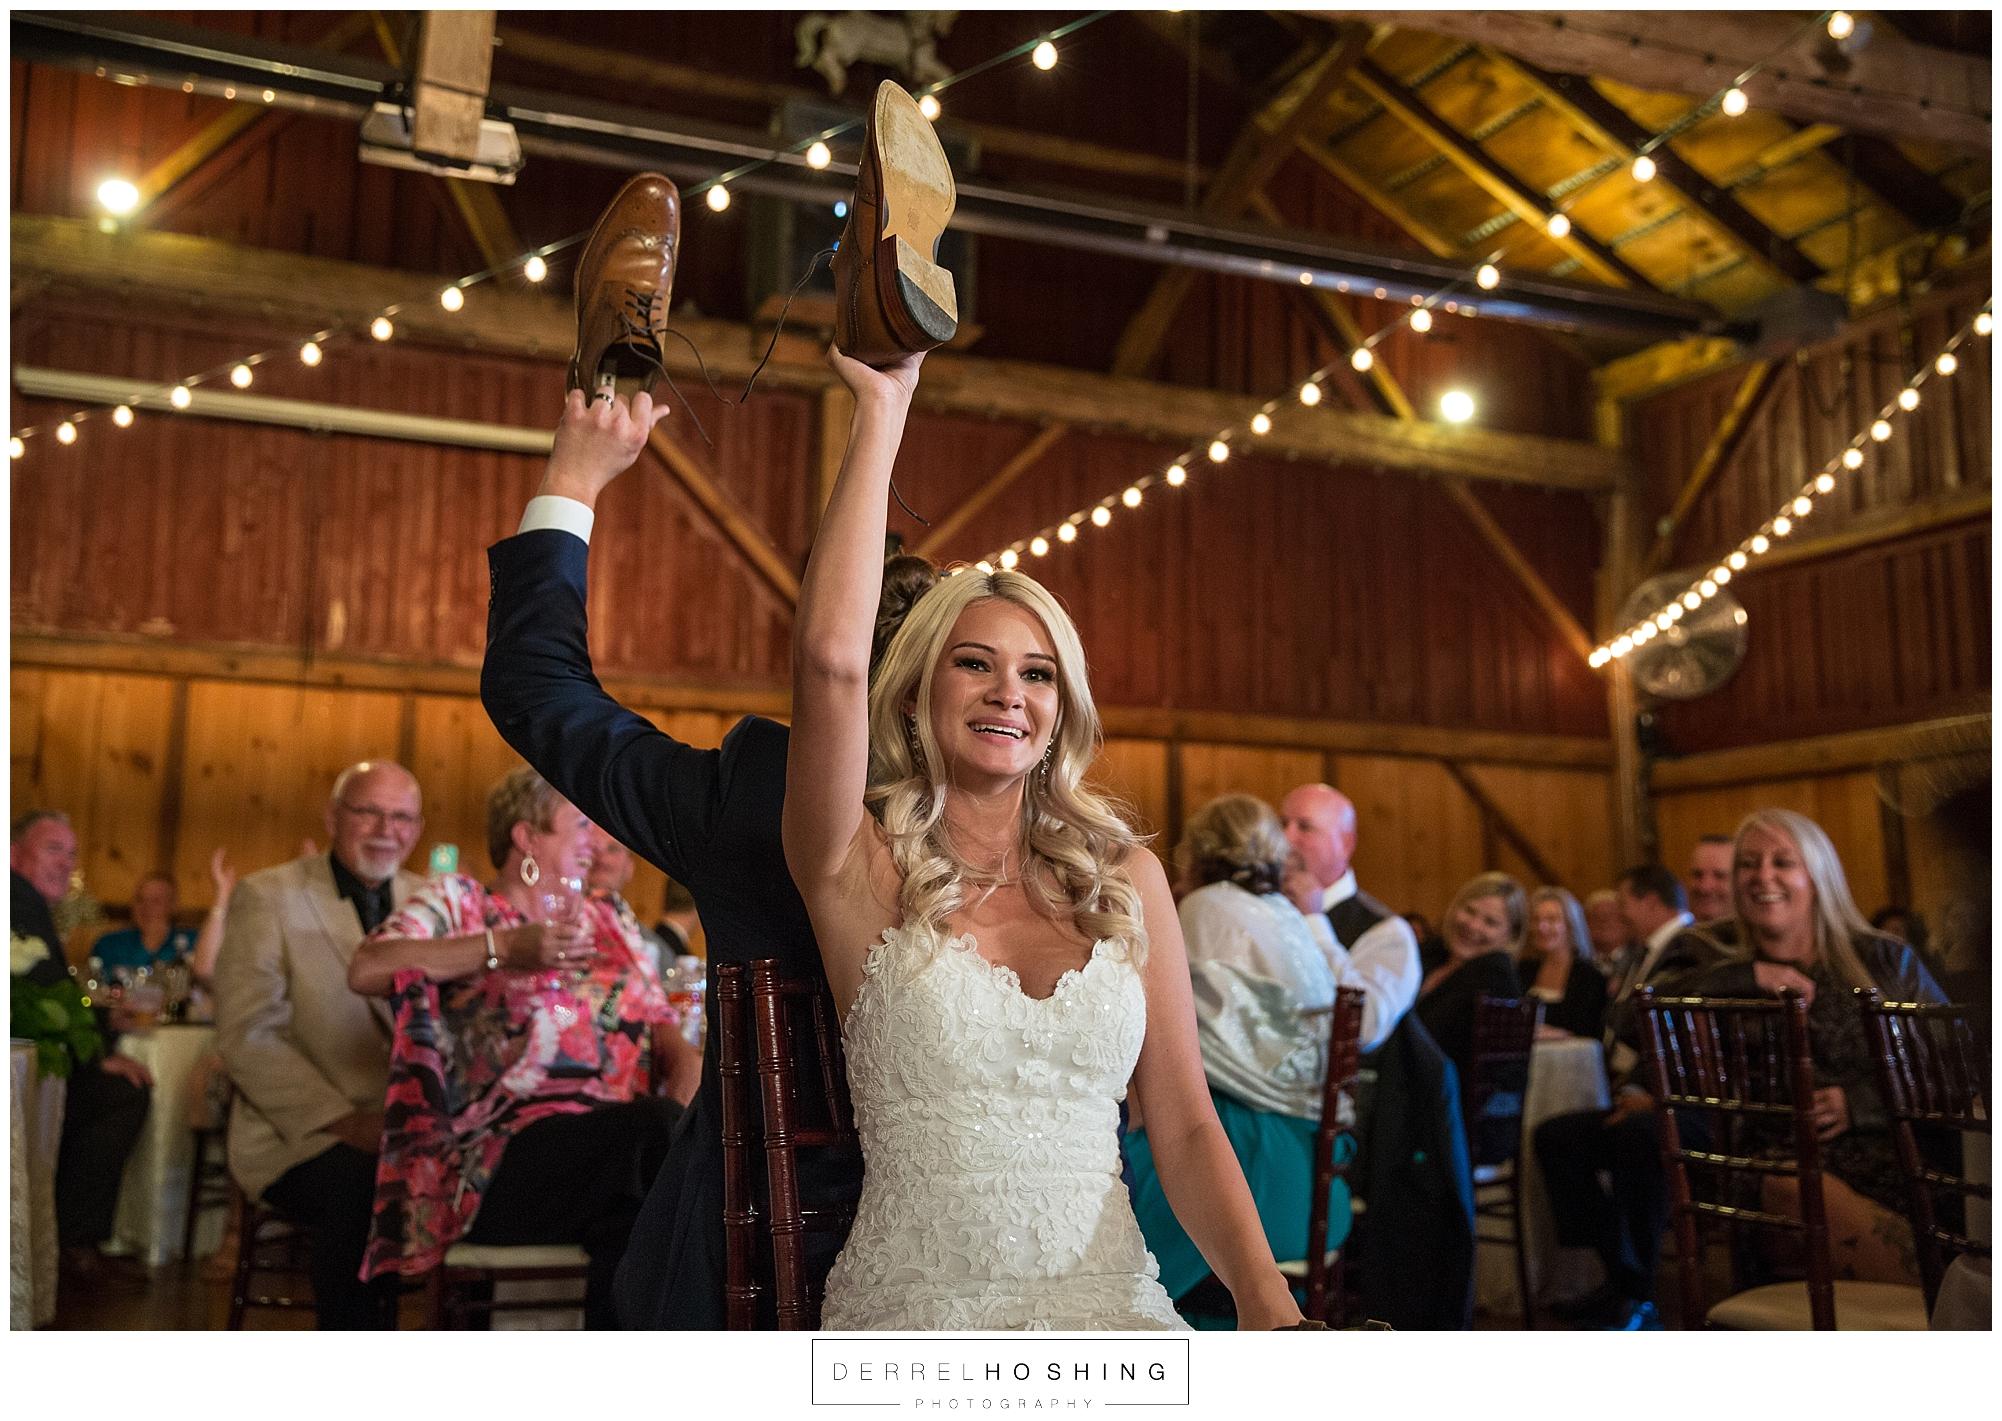 Belcroft-Estates-&-Event-Centre-Wedding-Innisfil-Ontario-0031.jpg